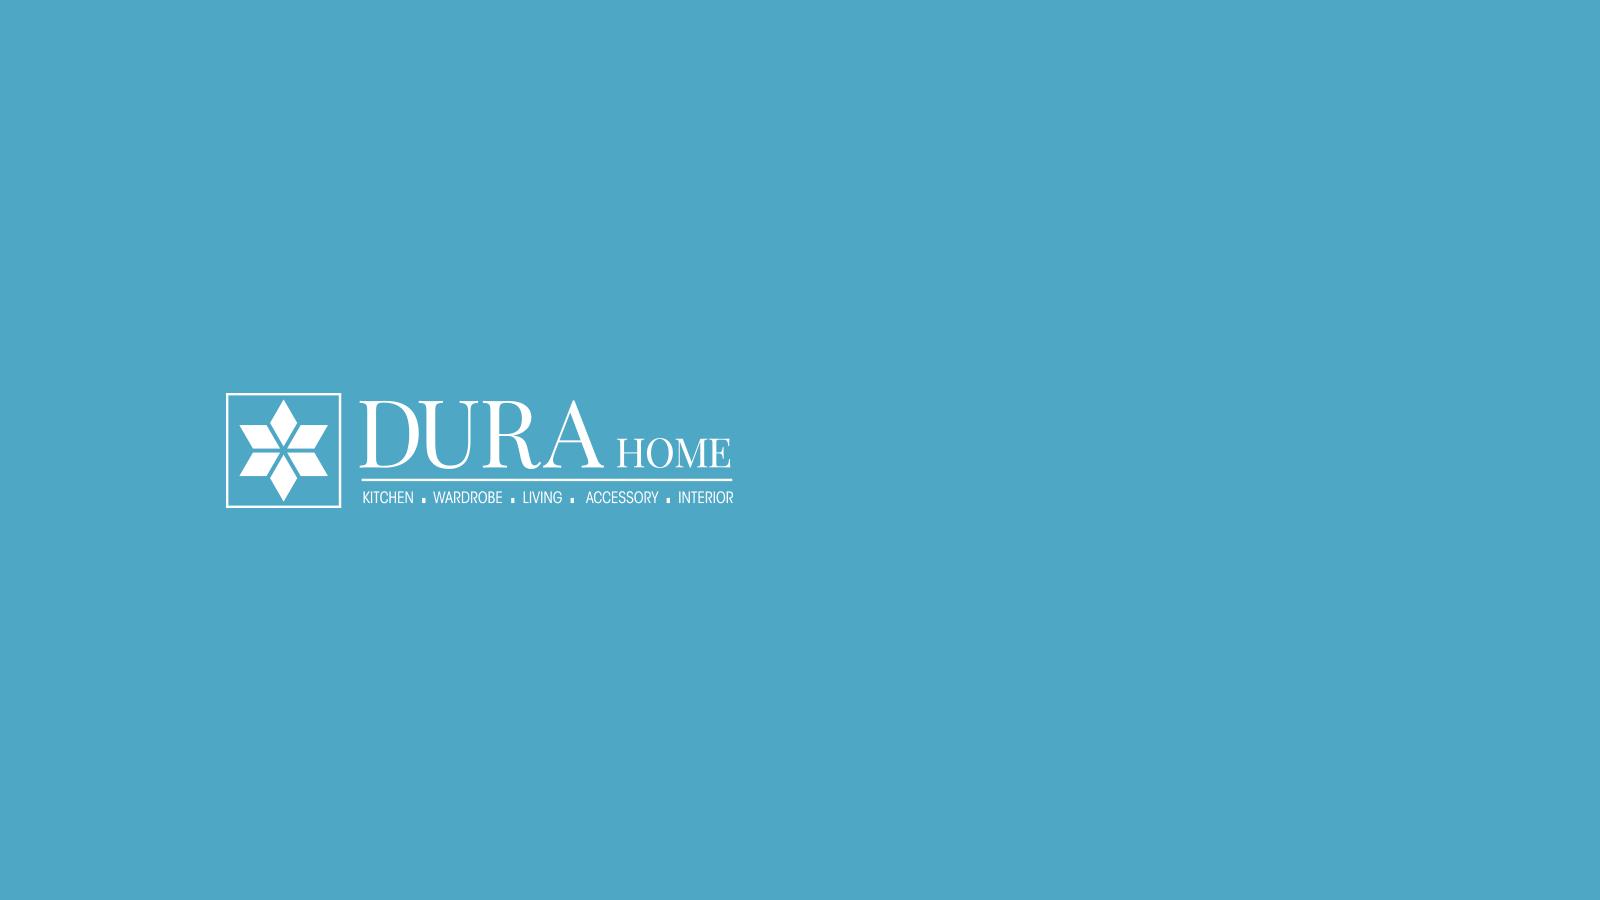 graphic-brand-design-web-designer-hiline-lahore-pakistan-dura-home-banner